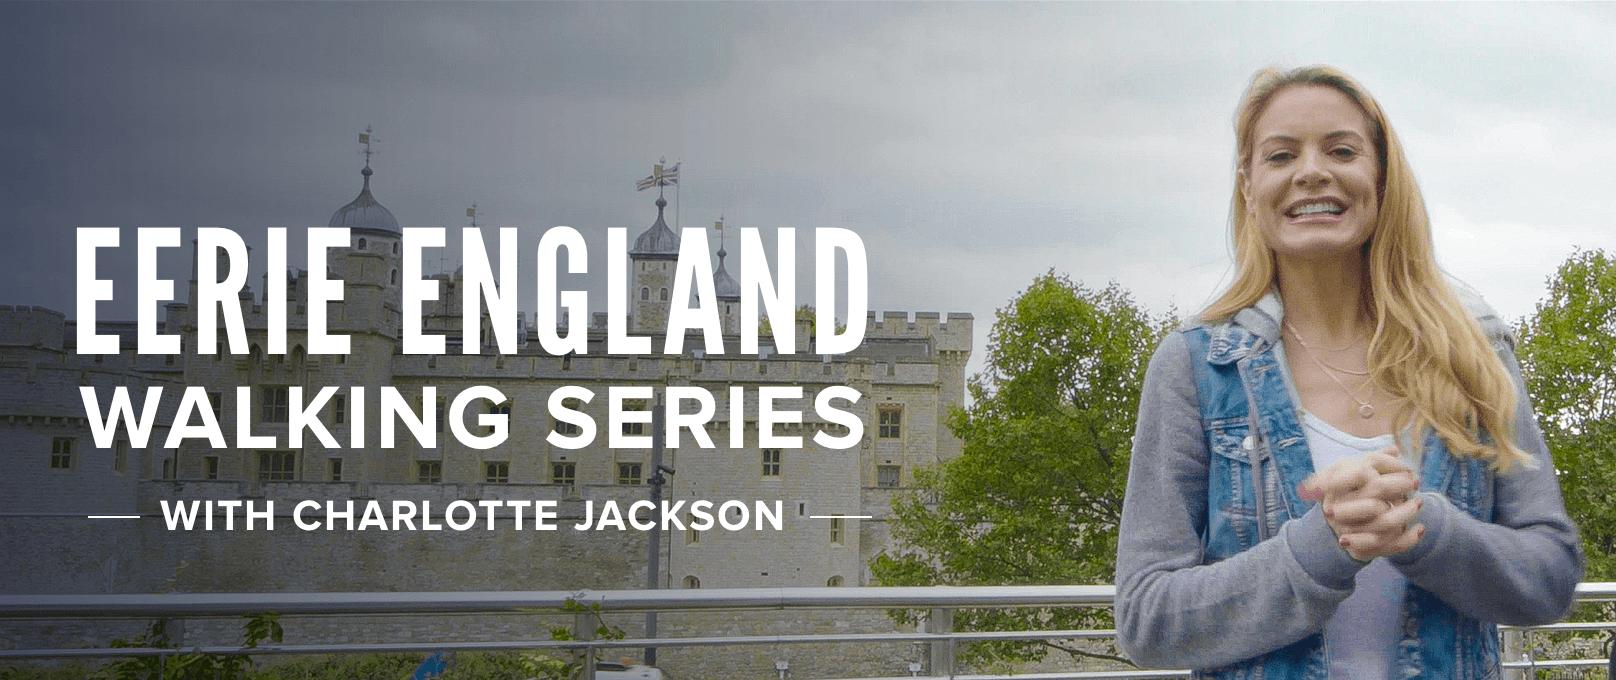 iFit Eerie England Walking Series walking workouts